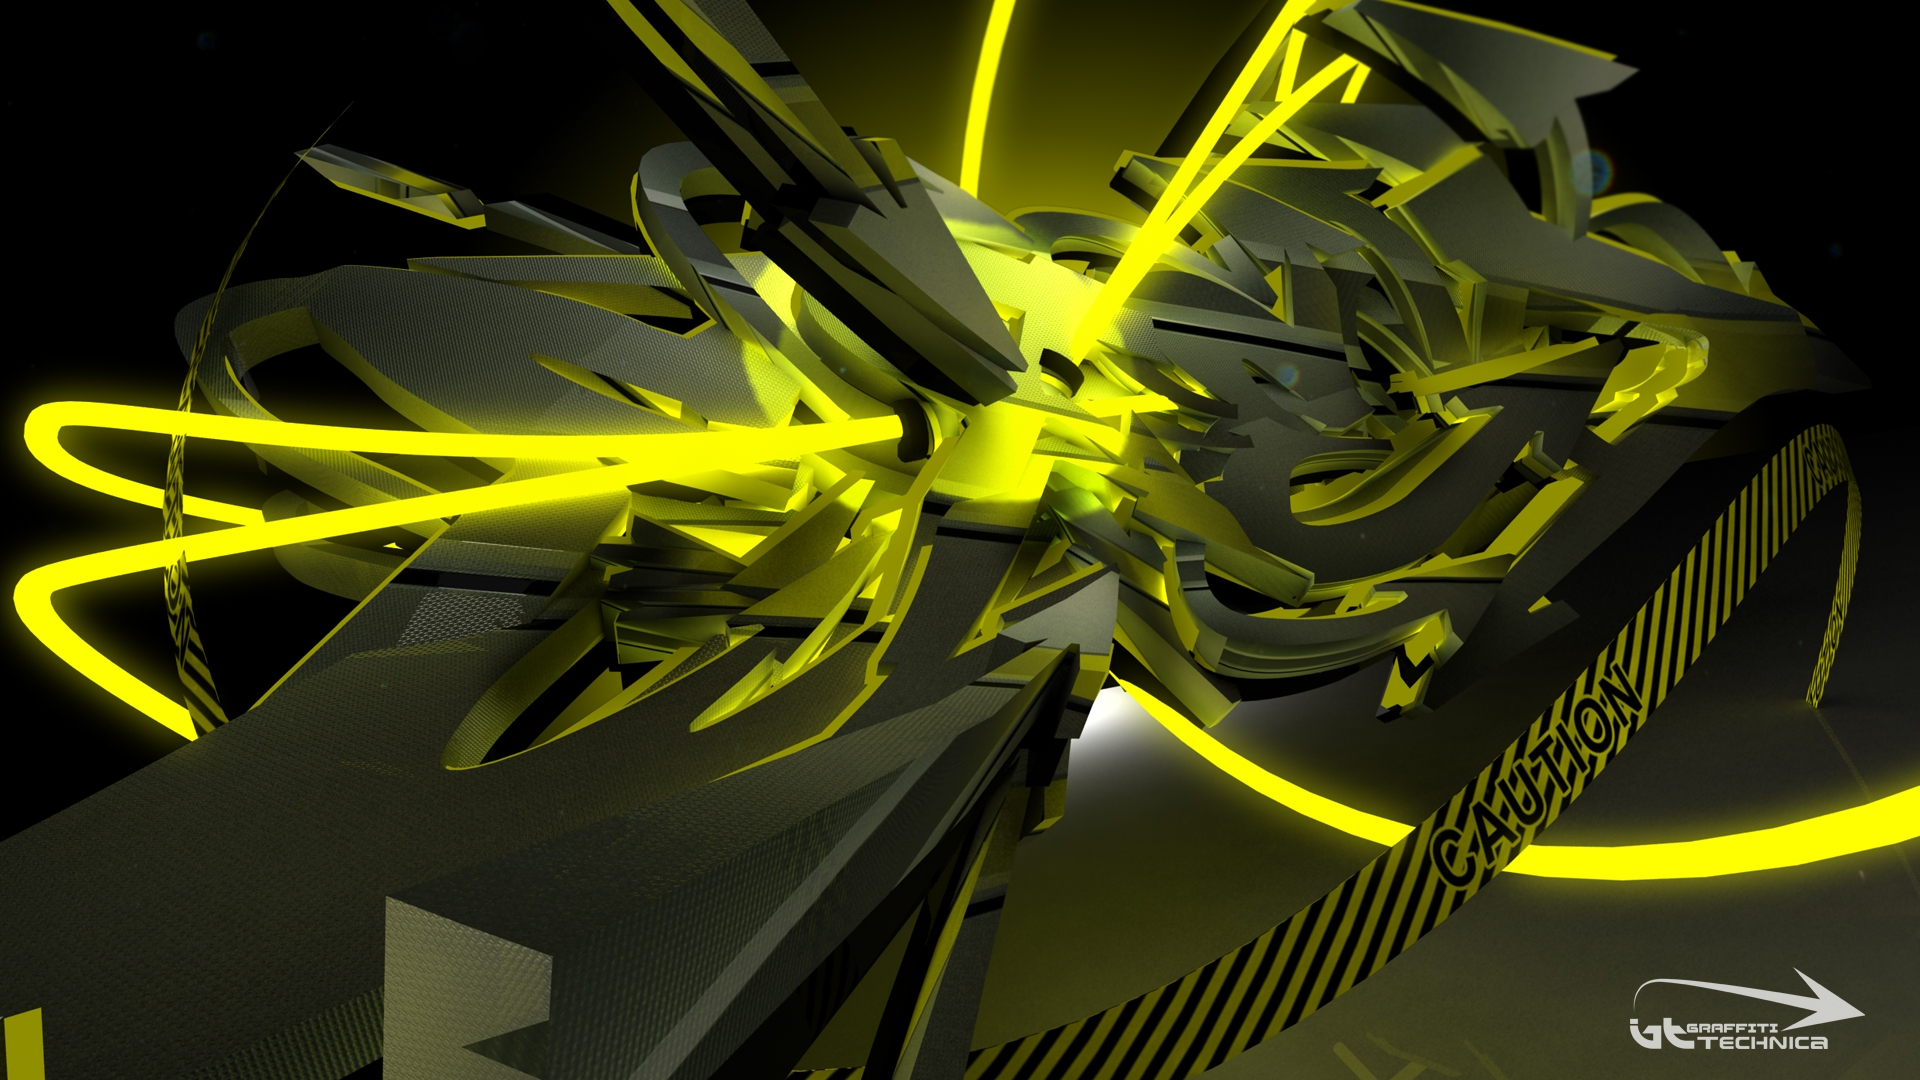 wp contentuploads2013053D Graffiti Neon Tron Desktop Wallpaperjpg 1920x1080